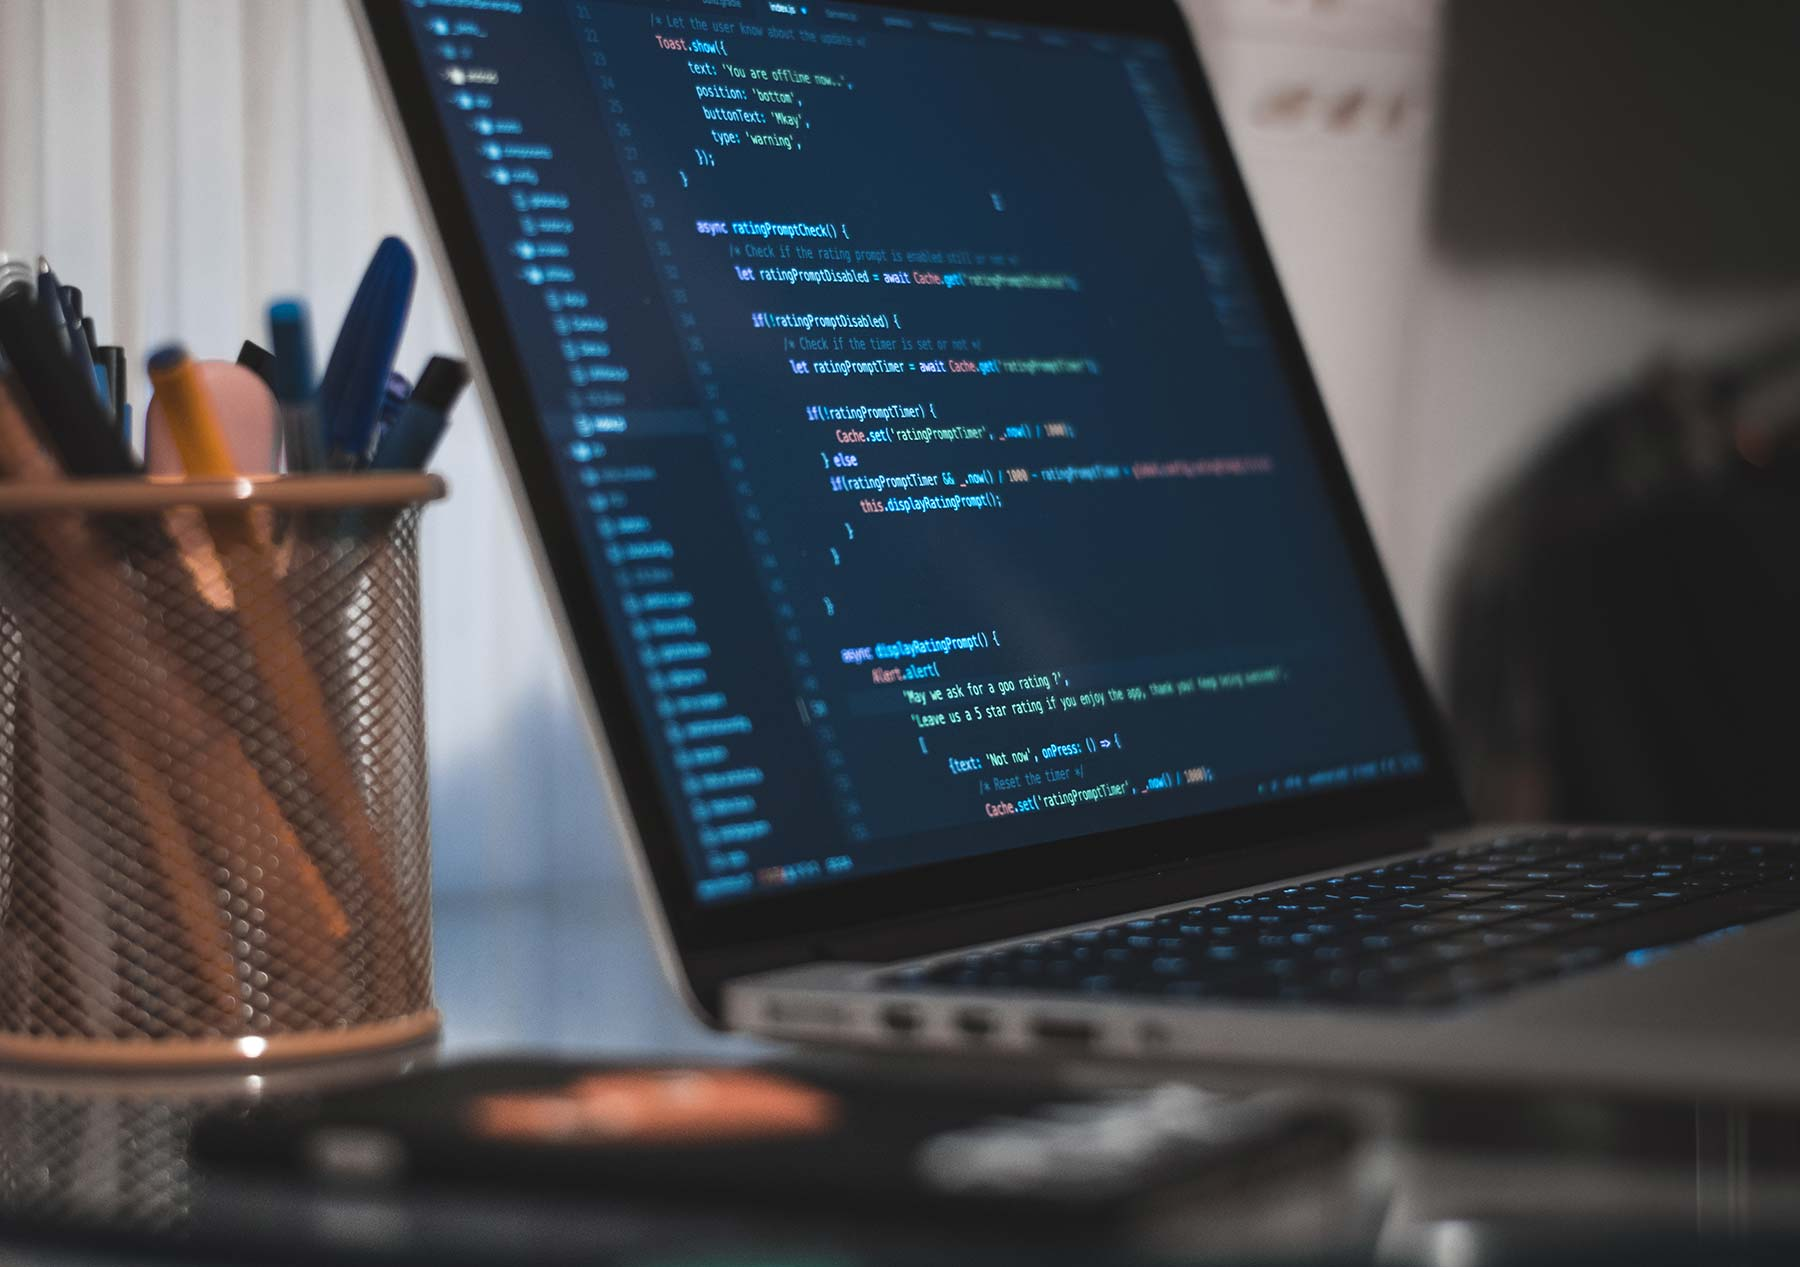 Ruby on Rails developer at Juicer.io